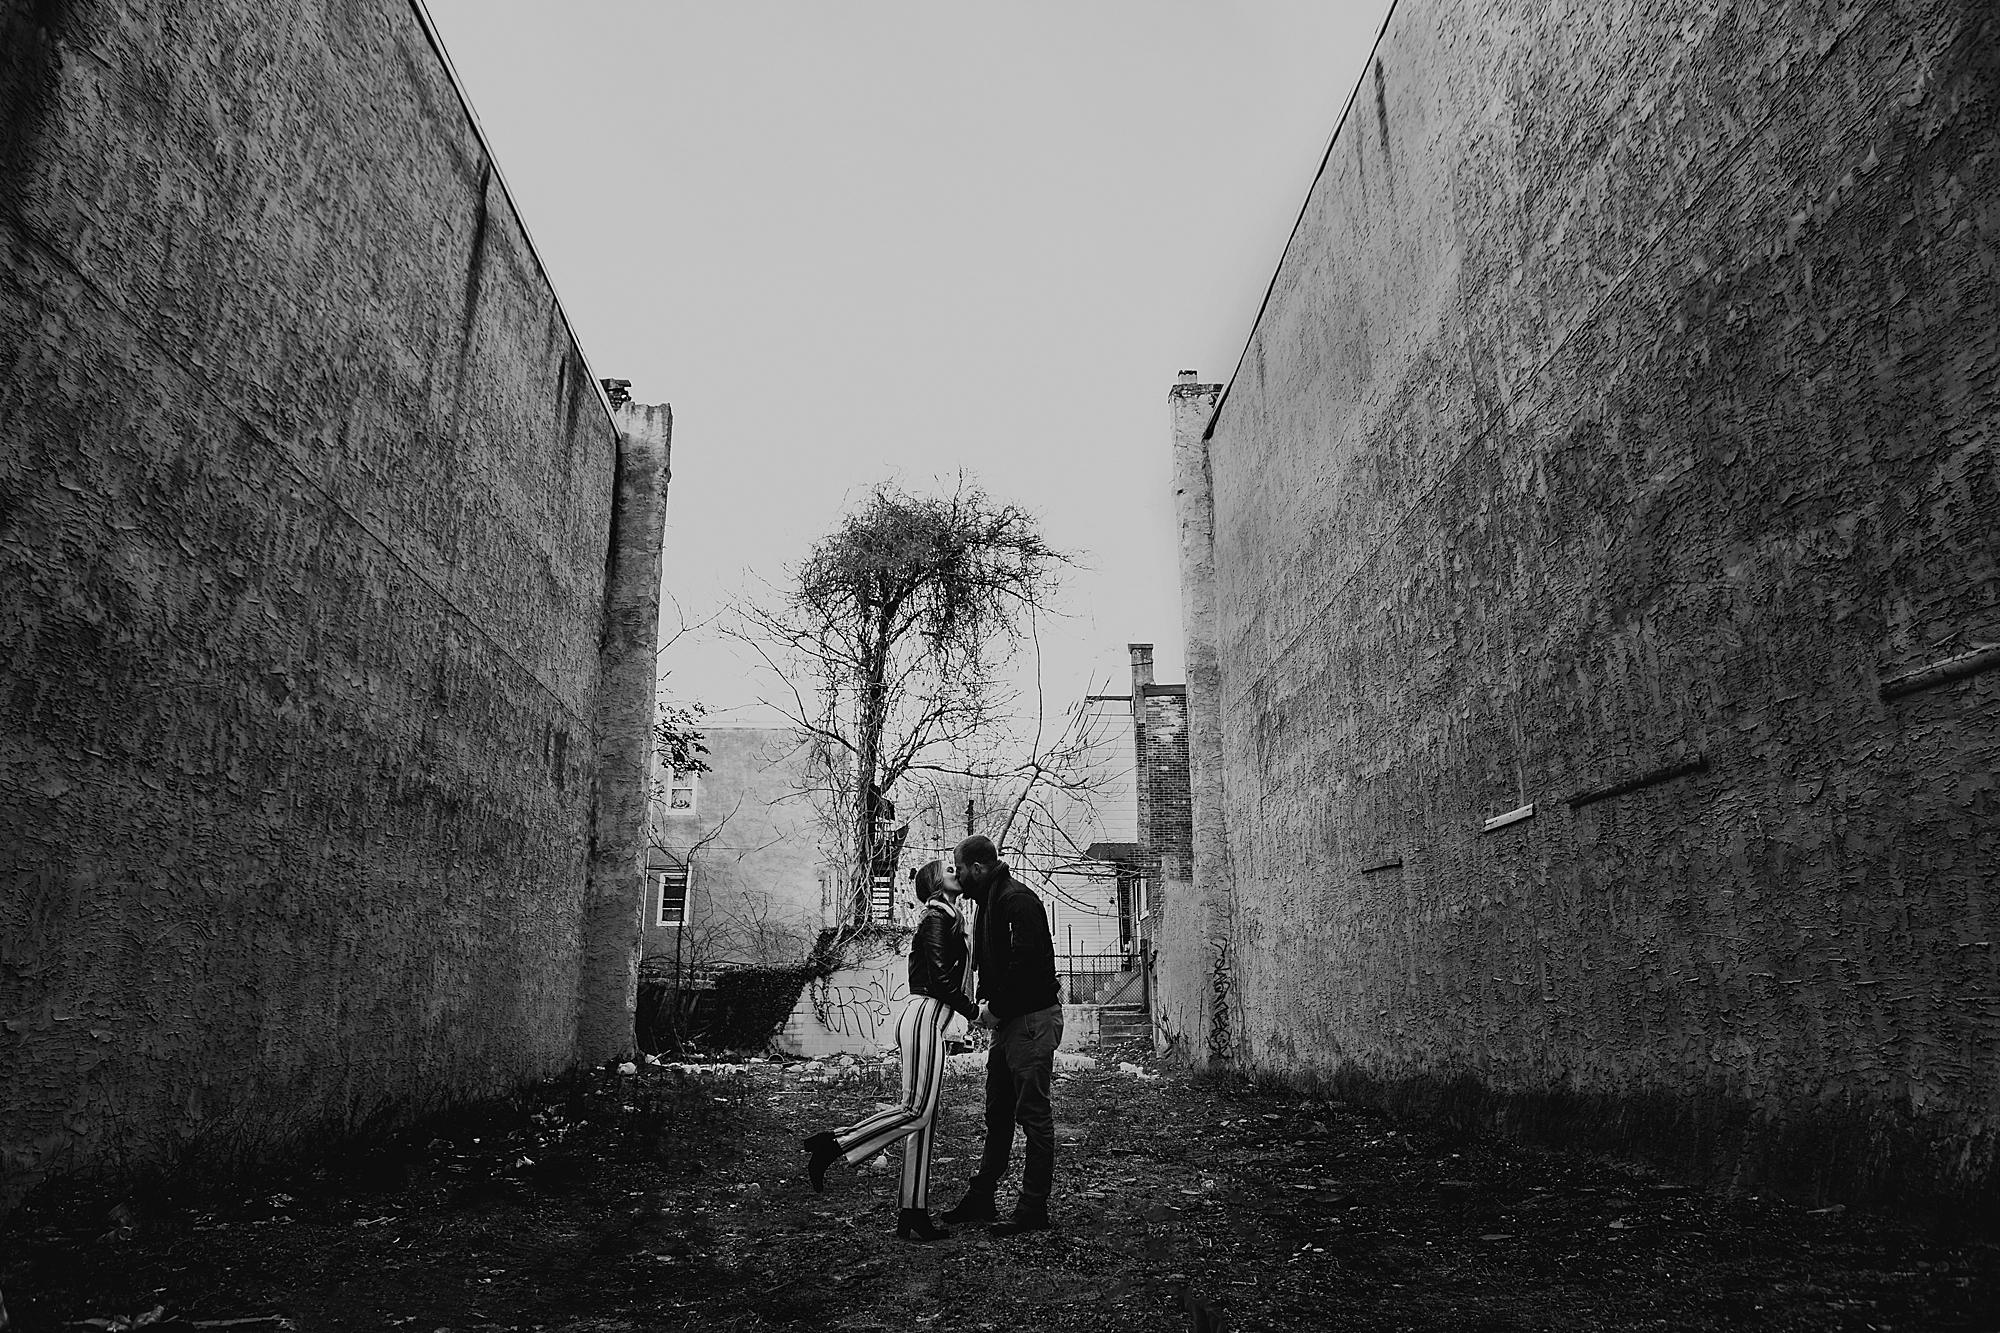 Joe_Mac_Creative_Philadelphia_Philly_Wedding_Photography_Steve_Love_Letters_To_Philadelphia__0006.jpg